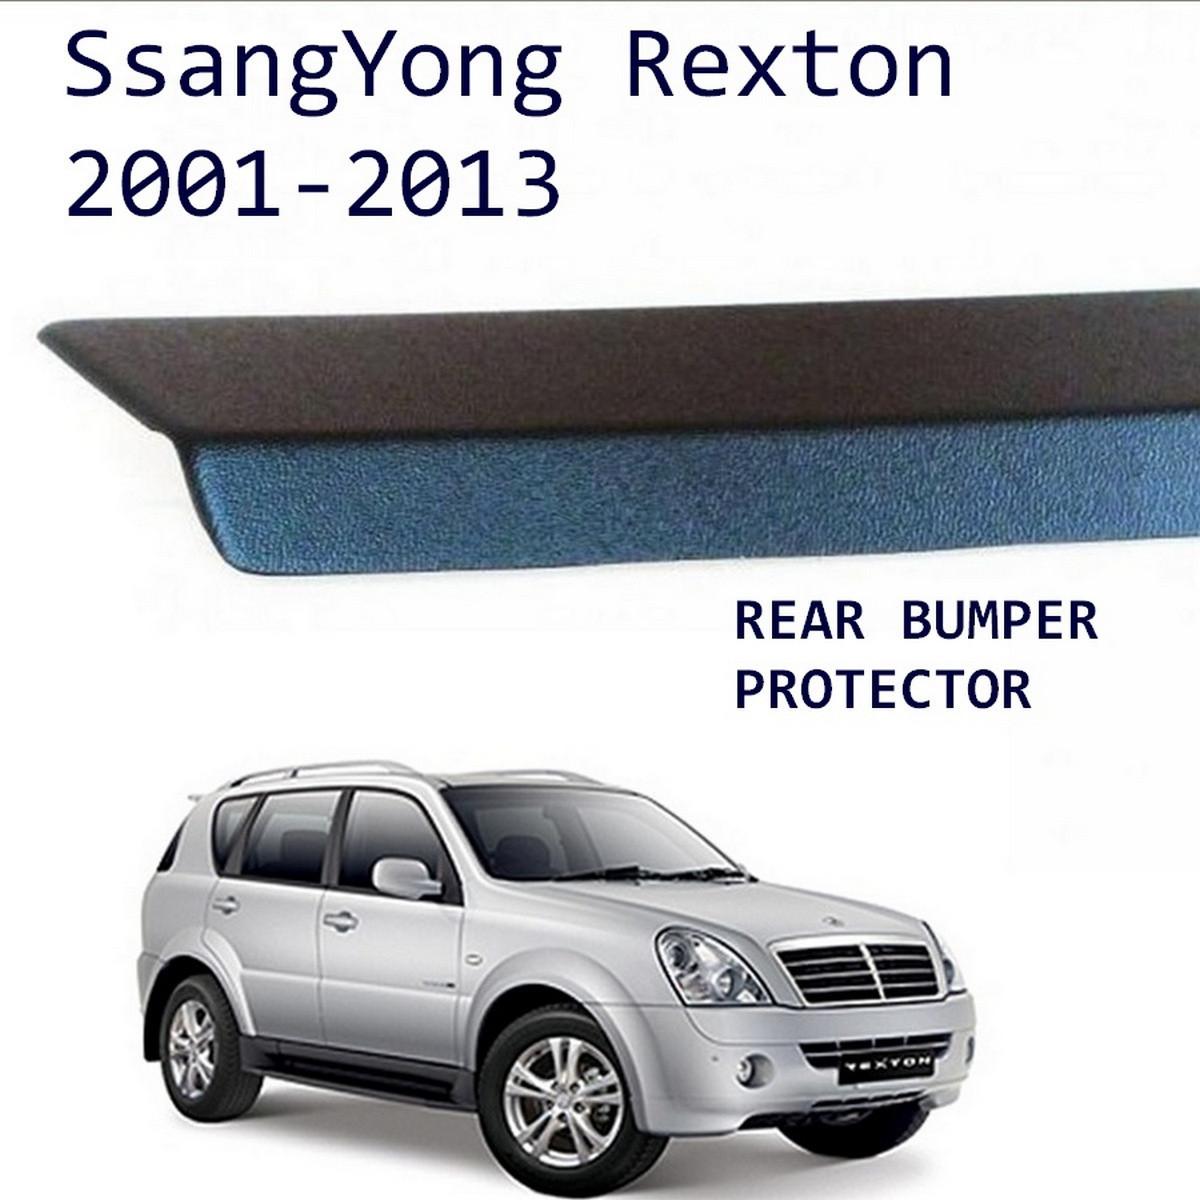 Пластикова захисна накладка заднього бампера для SsangYong Rexton I,II 2001-2013